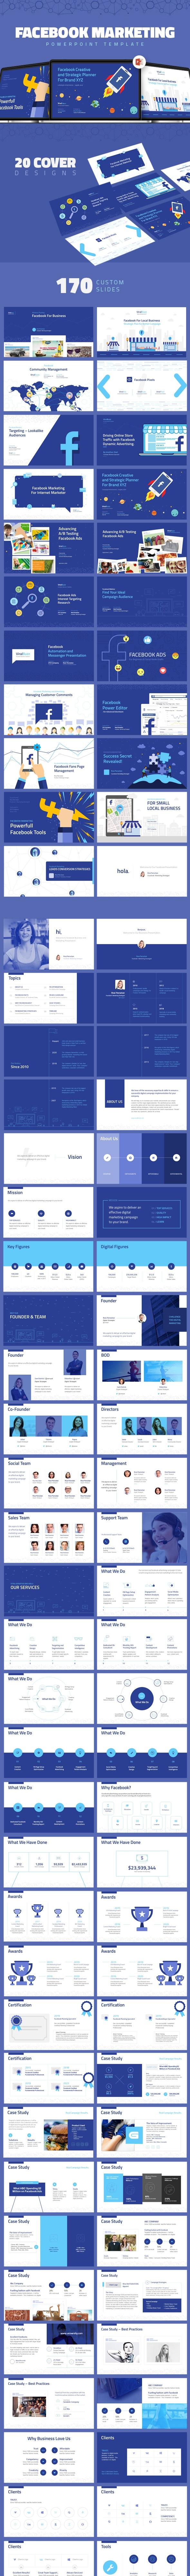 Facebook Marketing Presentation - Business PowerPoint Templates